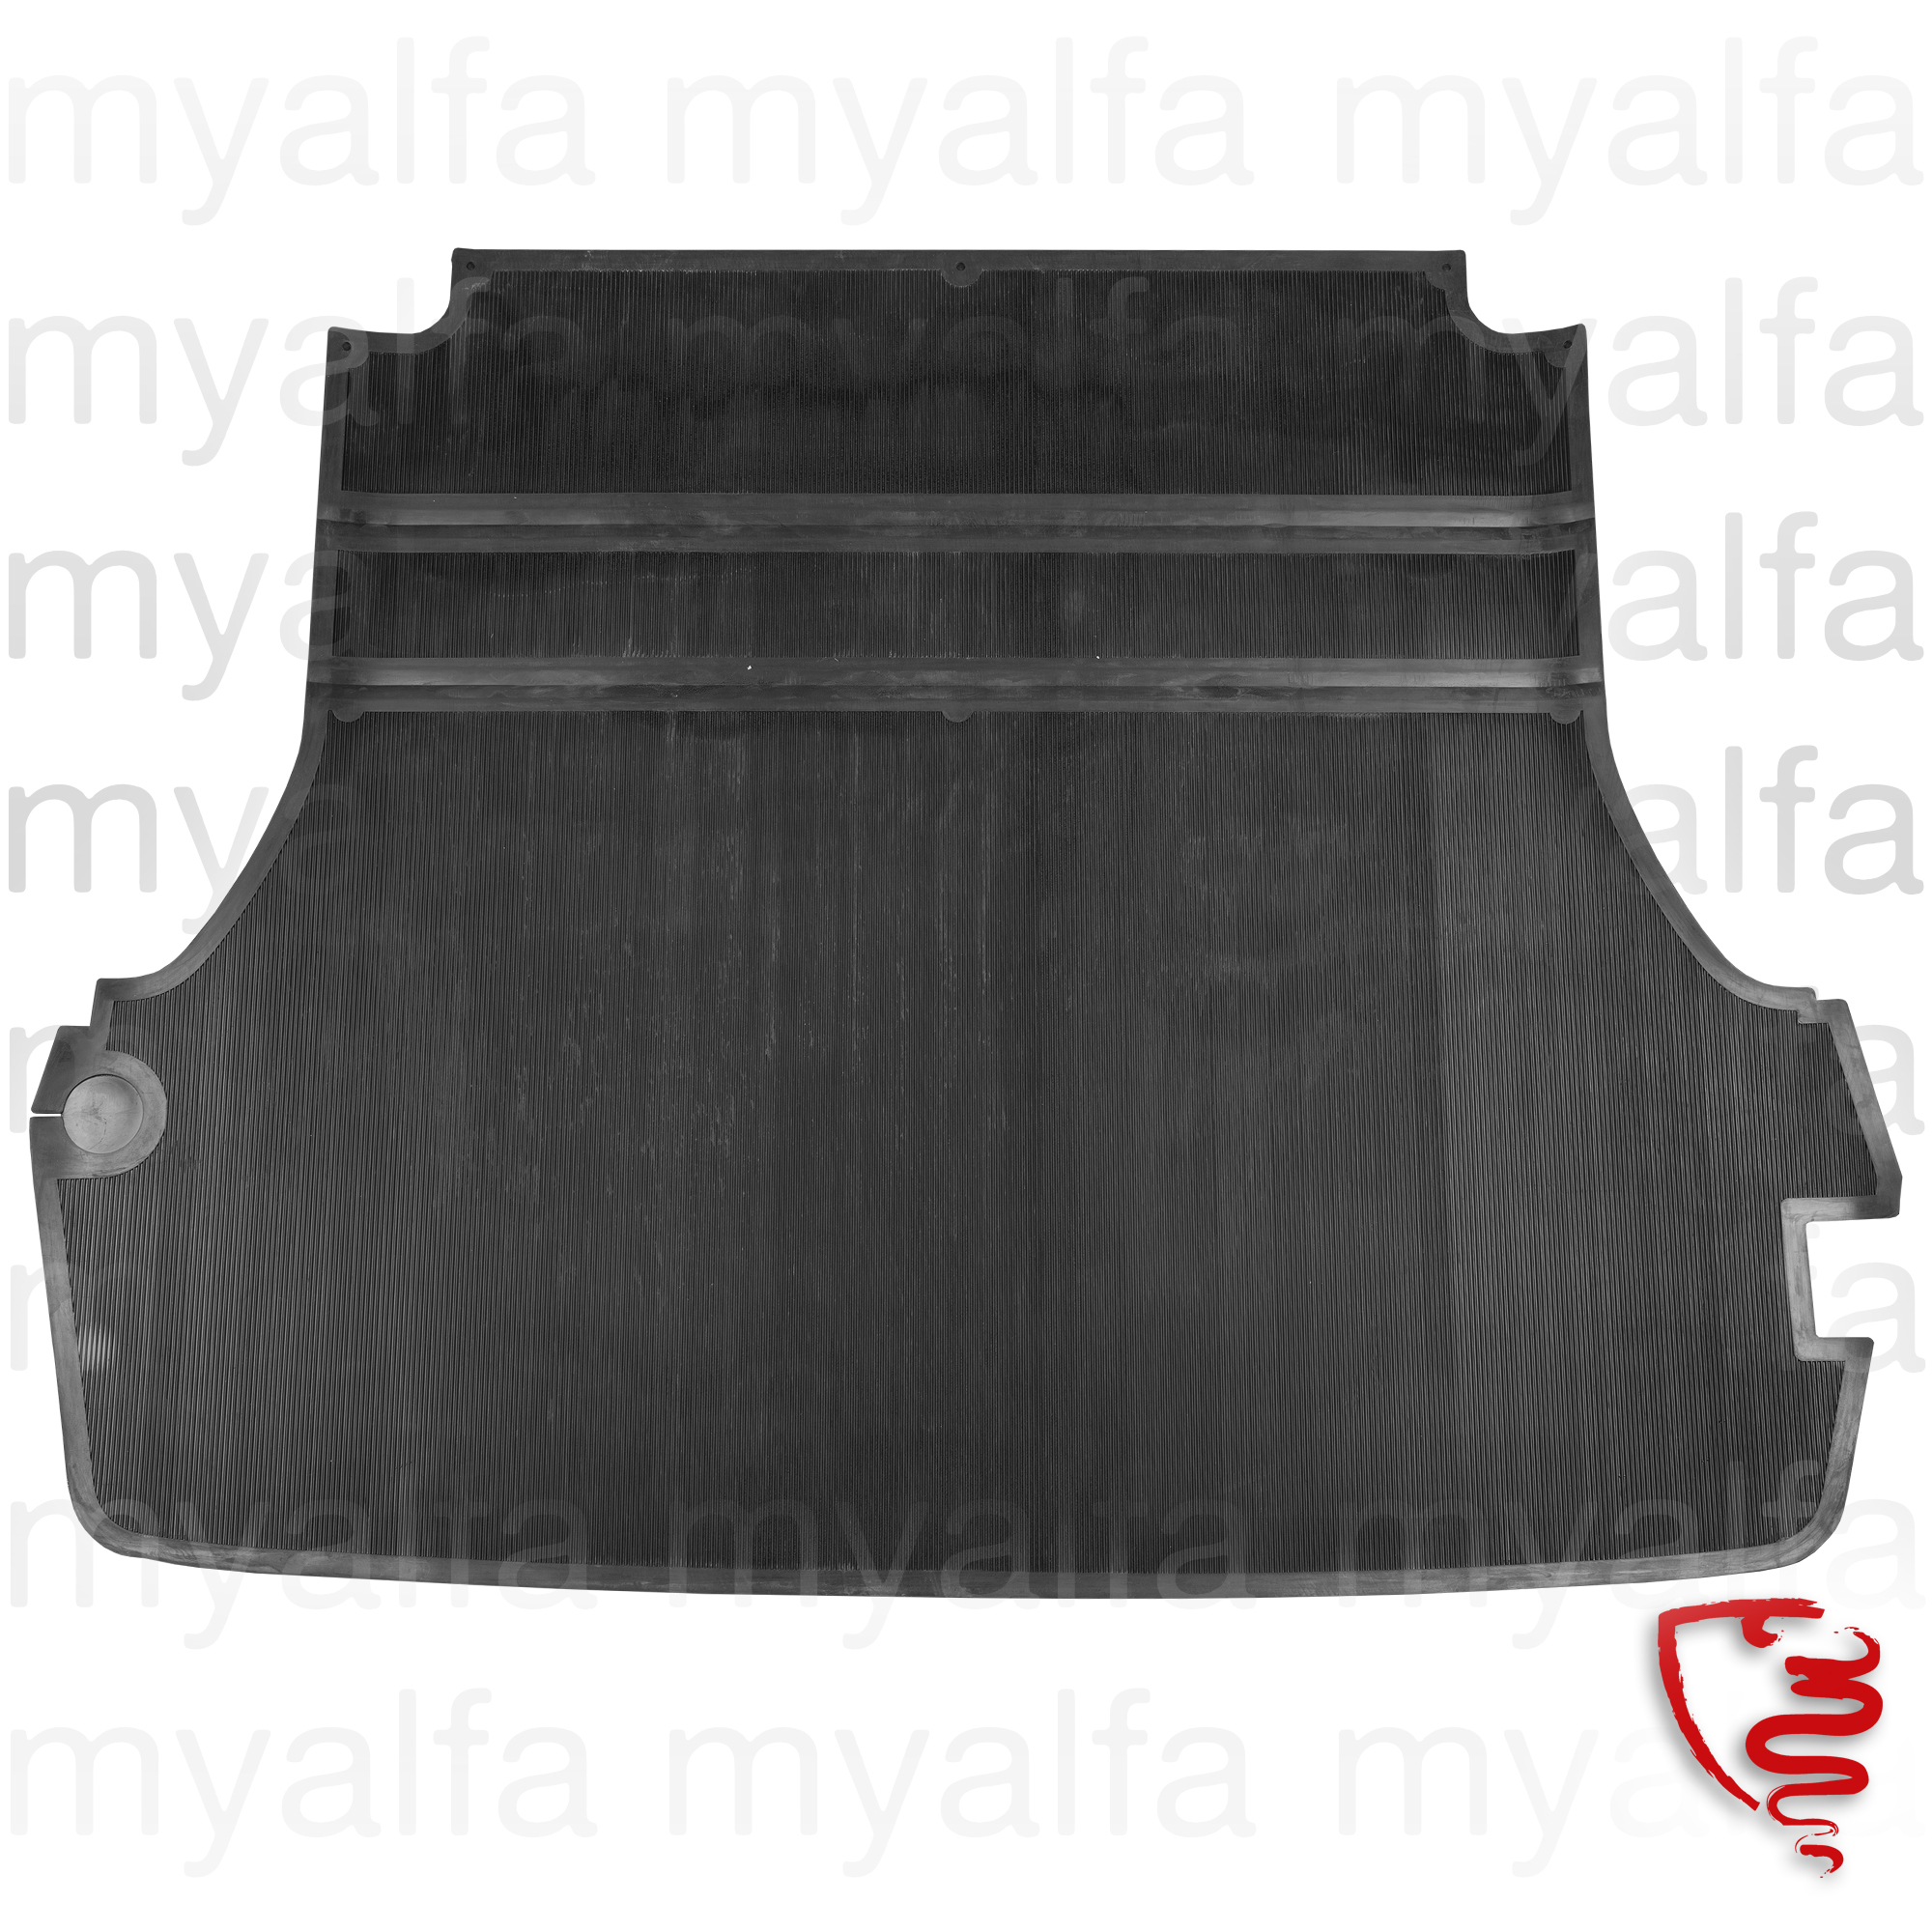 rubber mat of malado Spider for 105/115, Spider, Interior, Flooring, Rubber mats